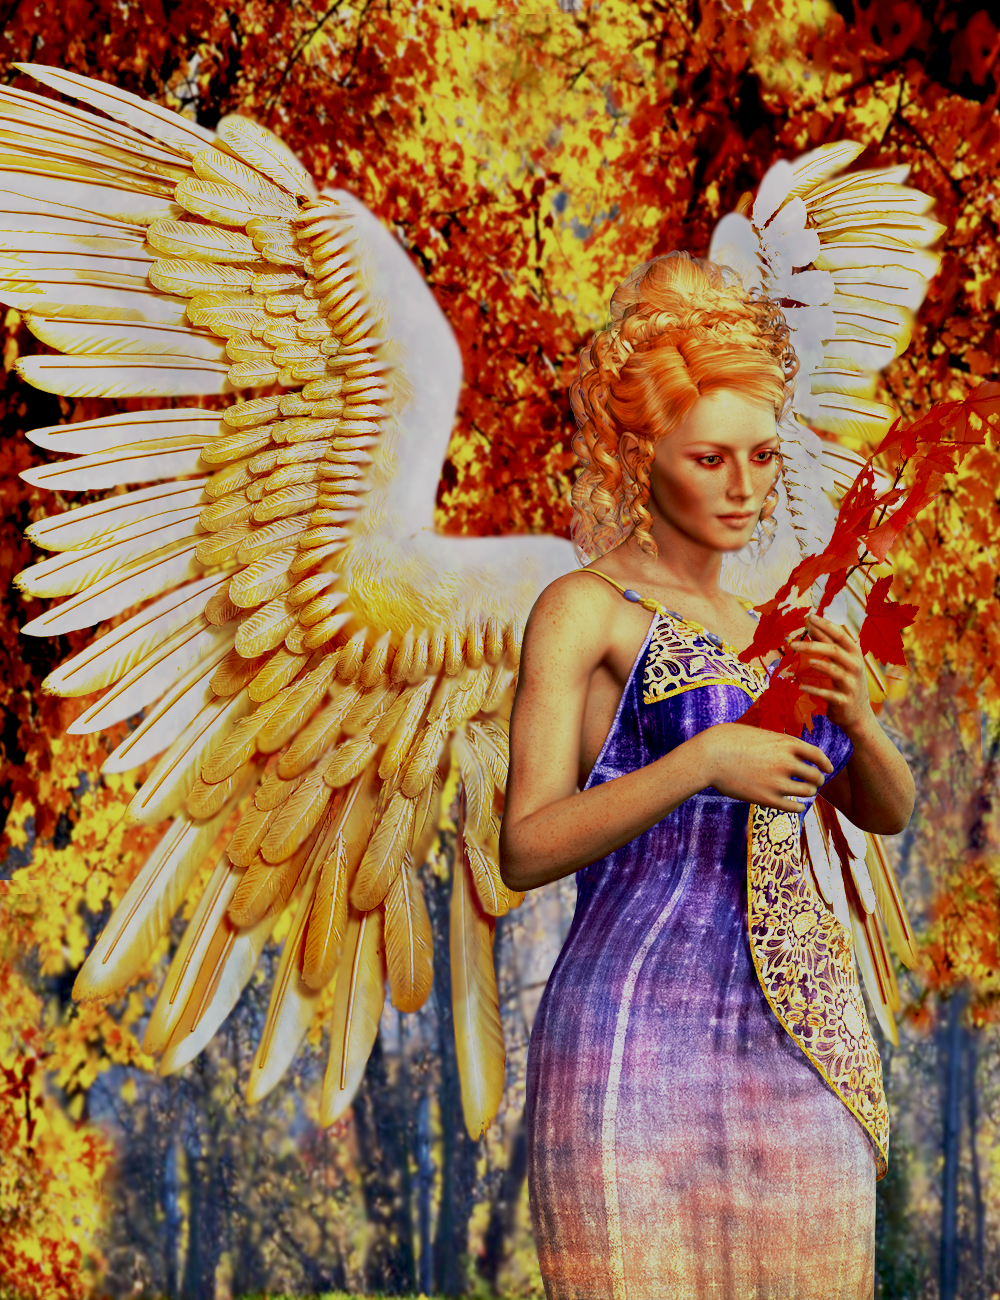 Angel of October